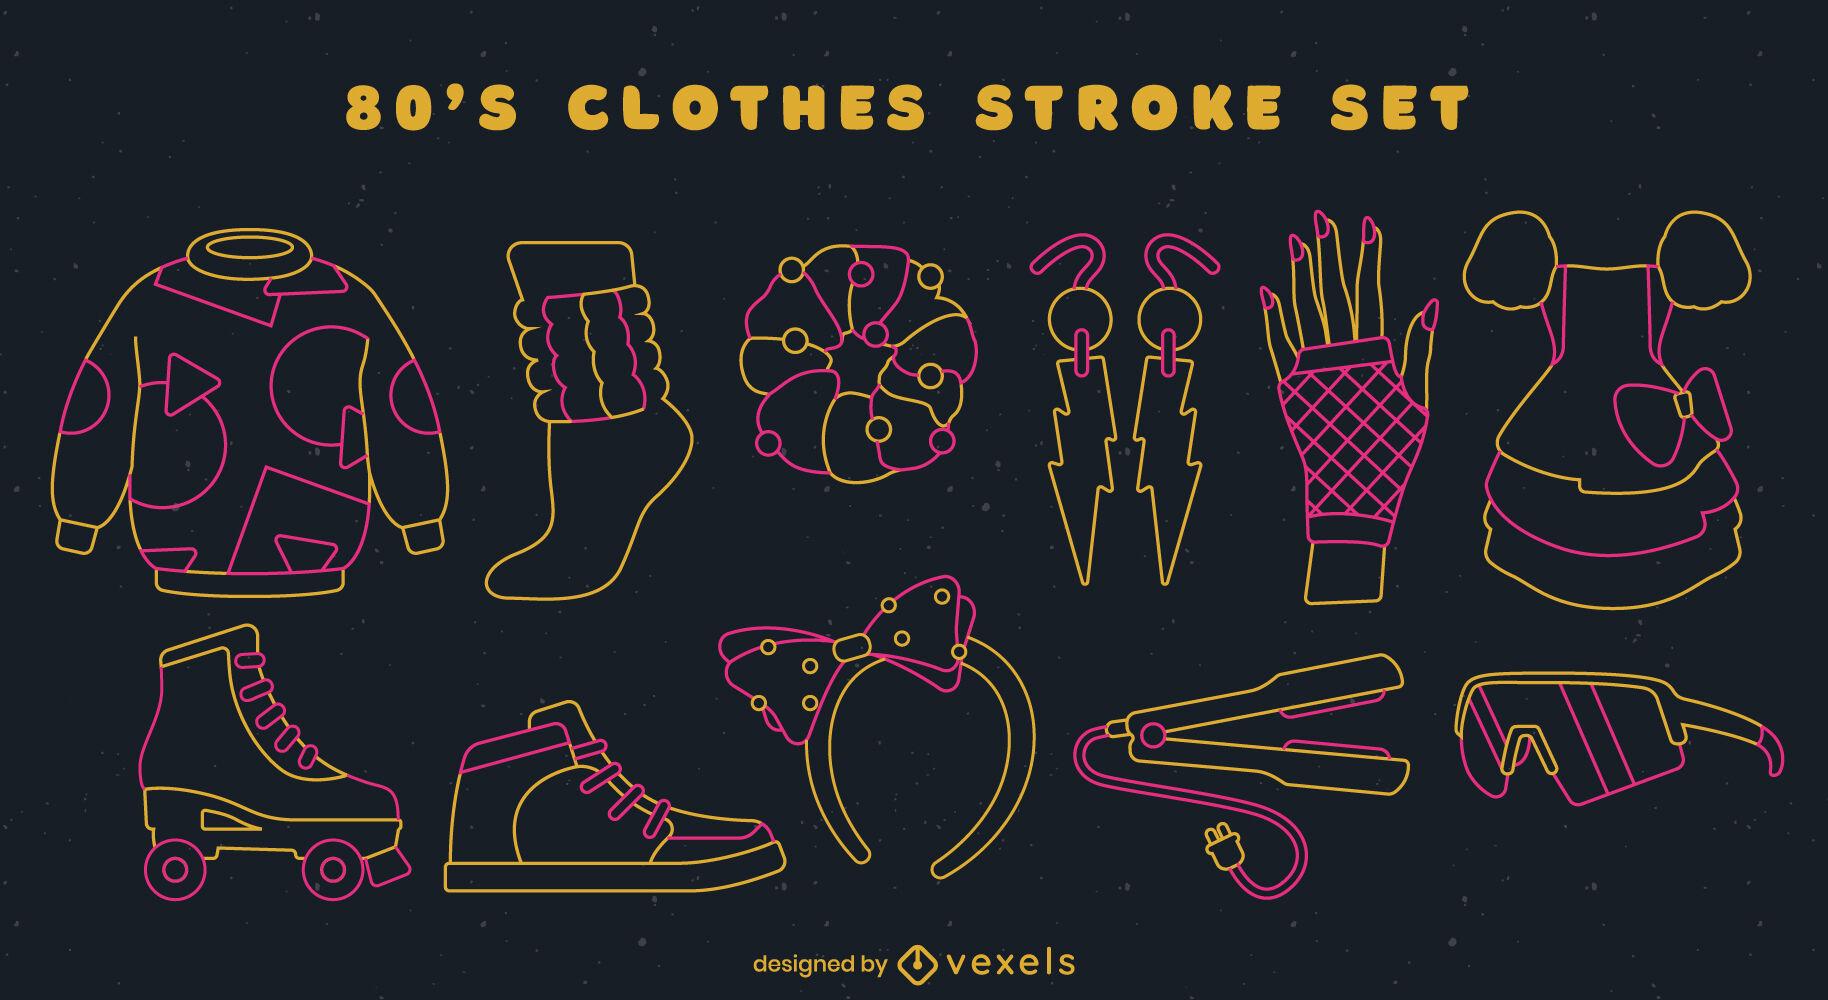 80s clothing set stroke